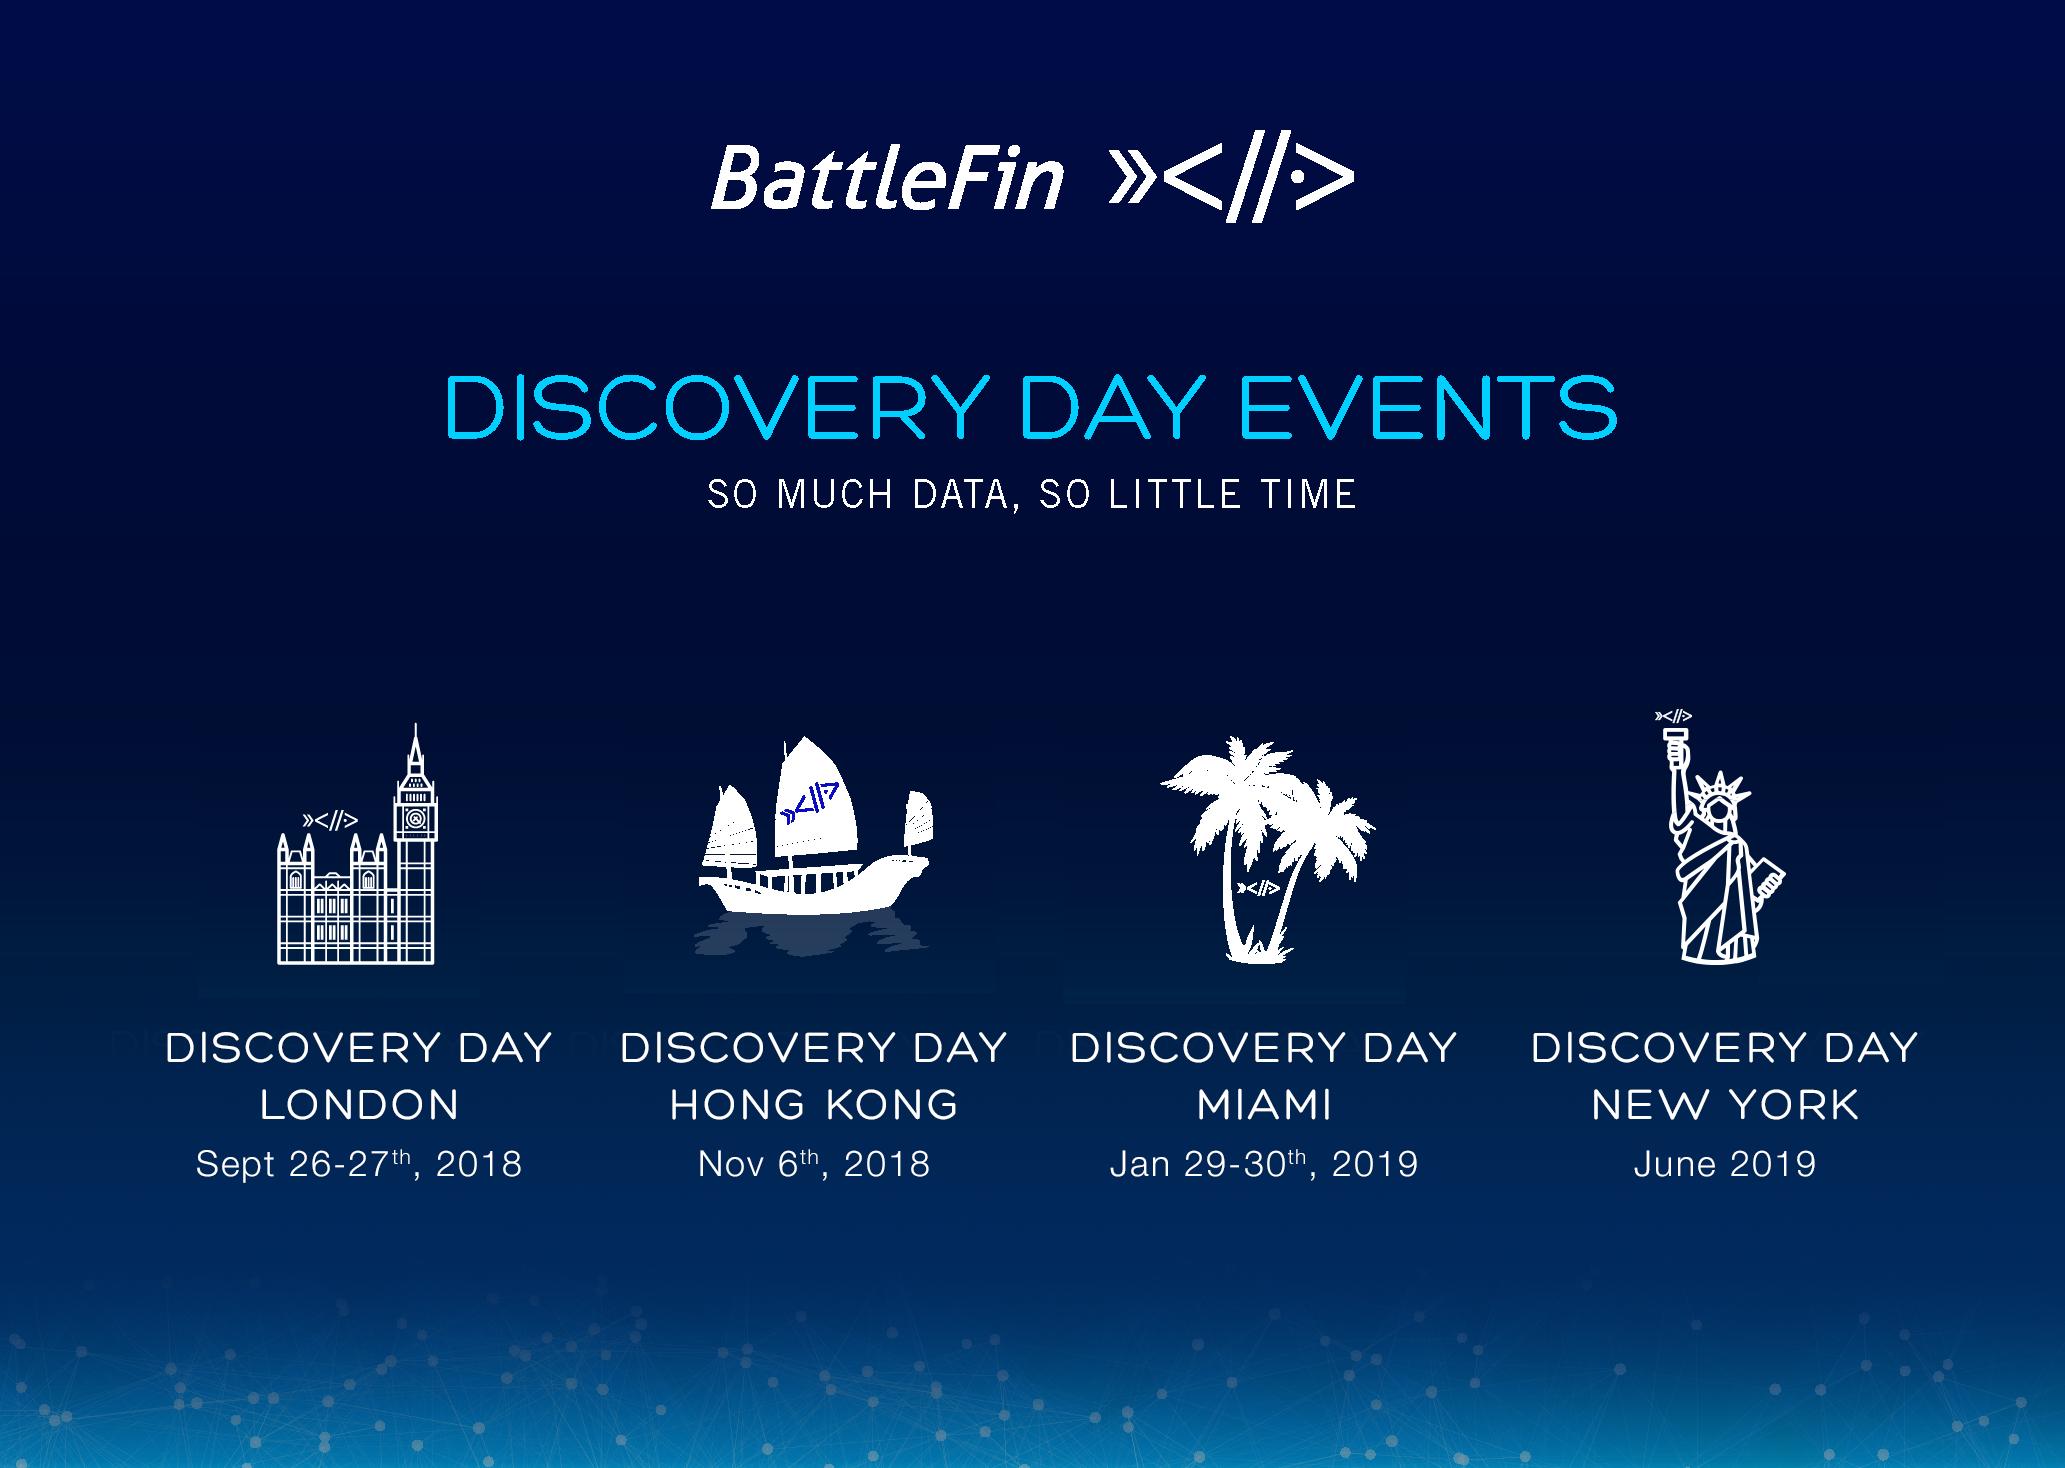 Battlefin-4events-postcard-2018-3.png